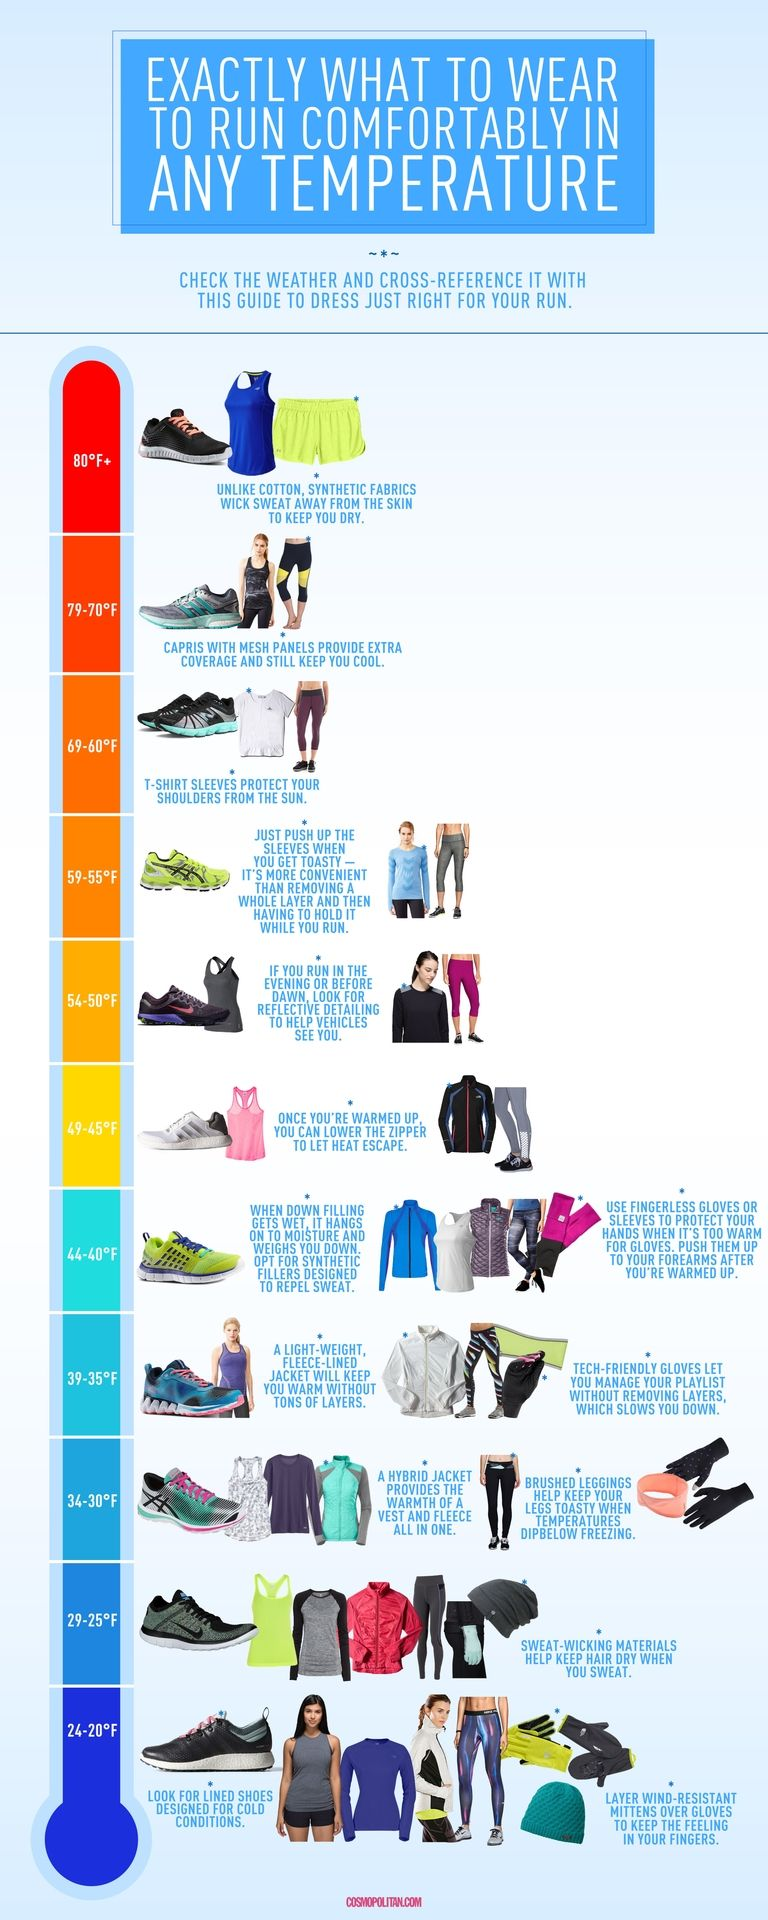 Consejos para usar capas al vestir para correr en clima frío infografia